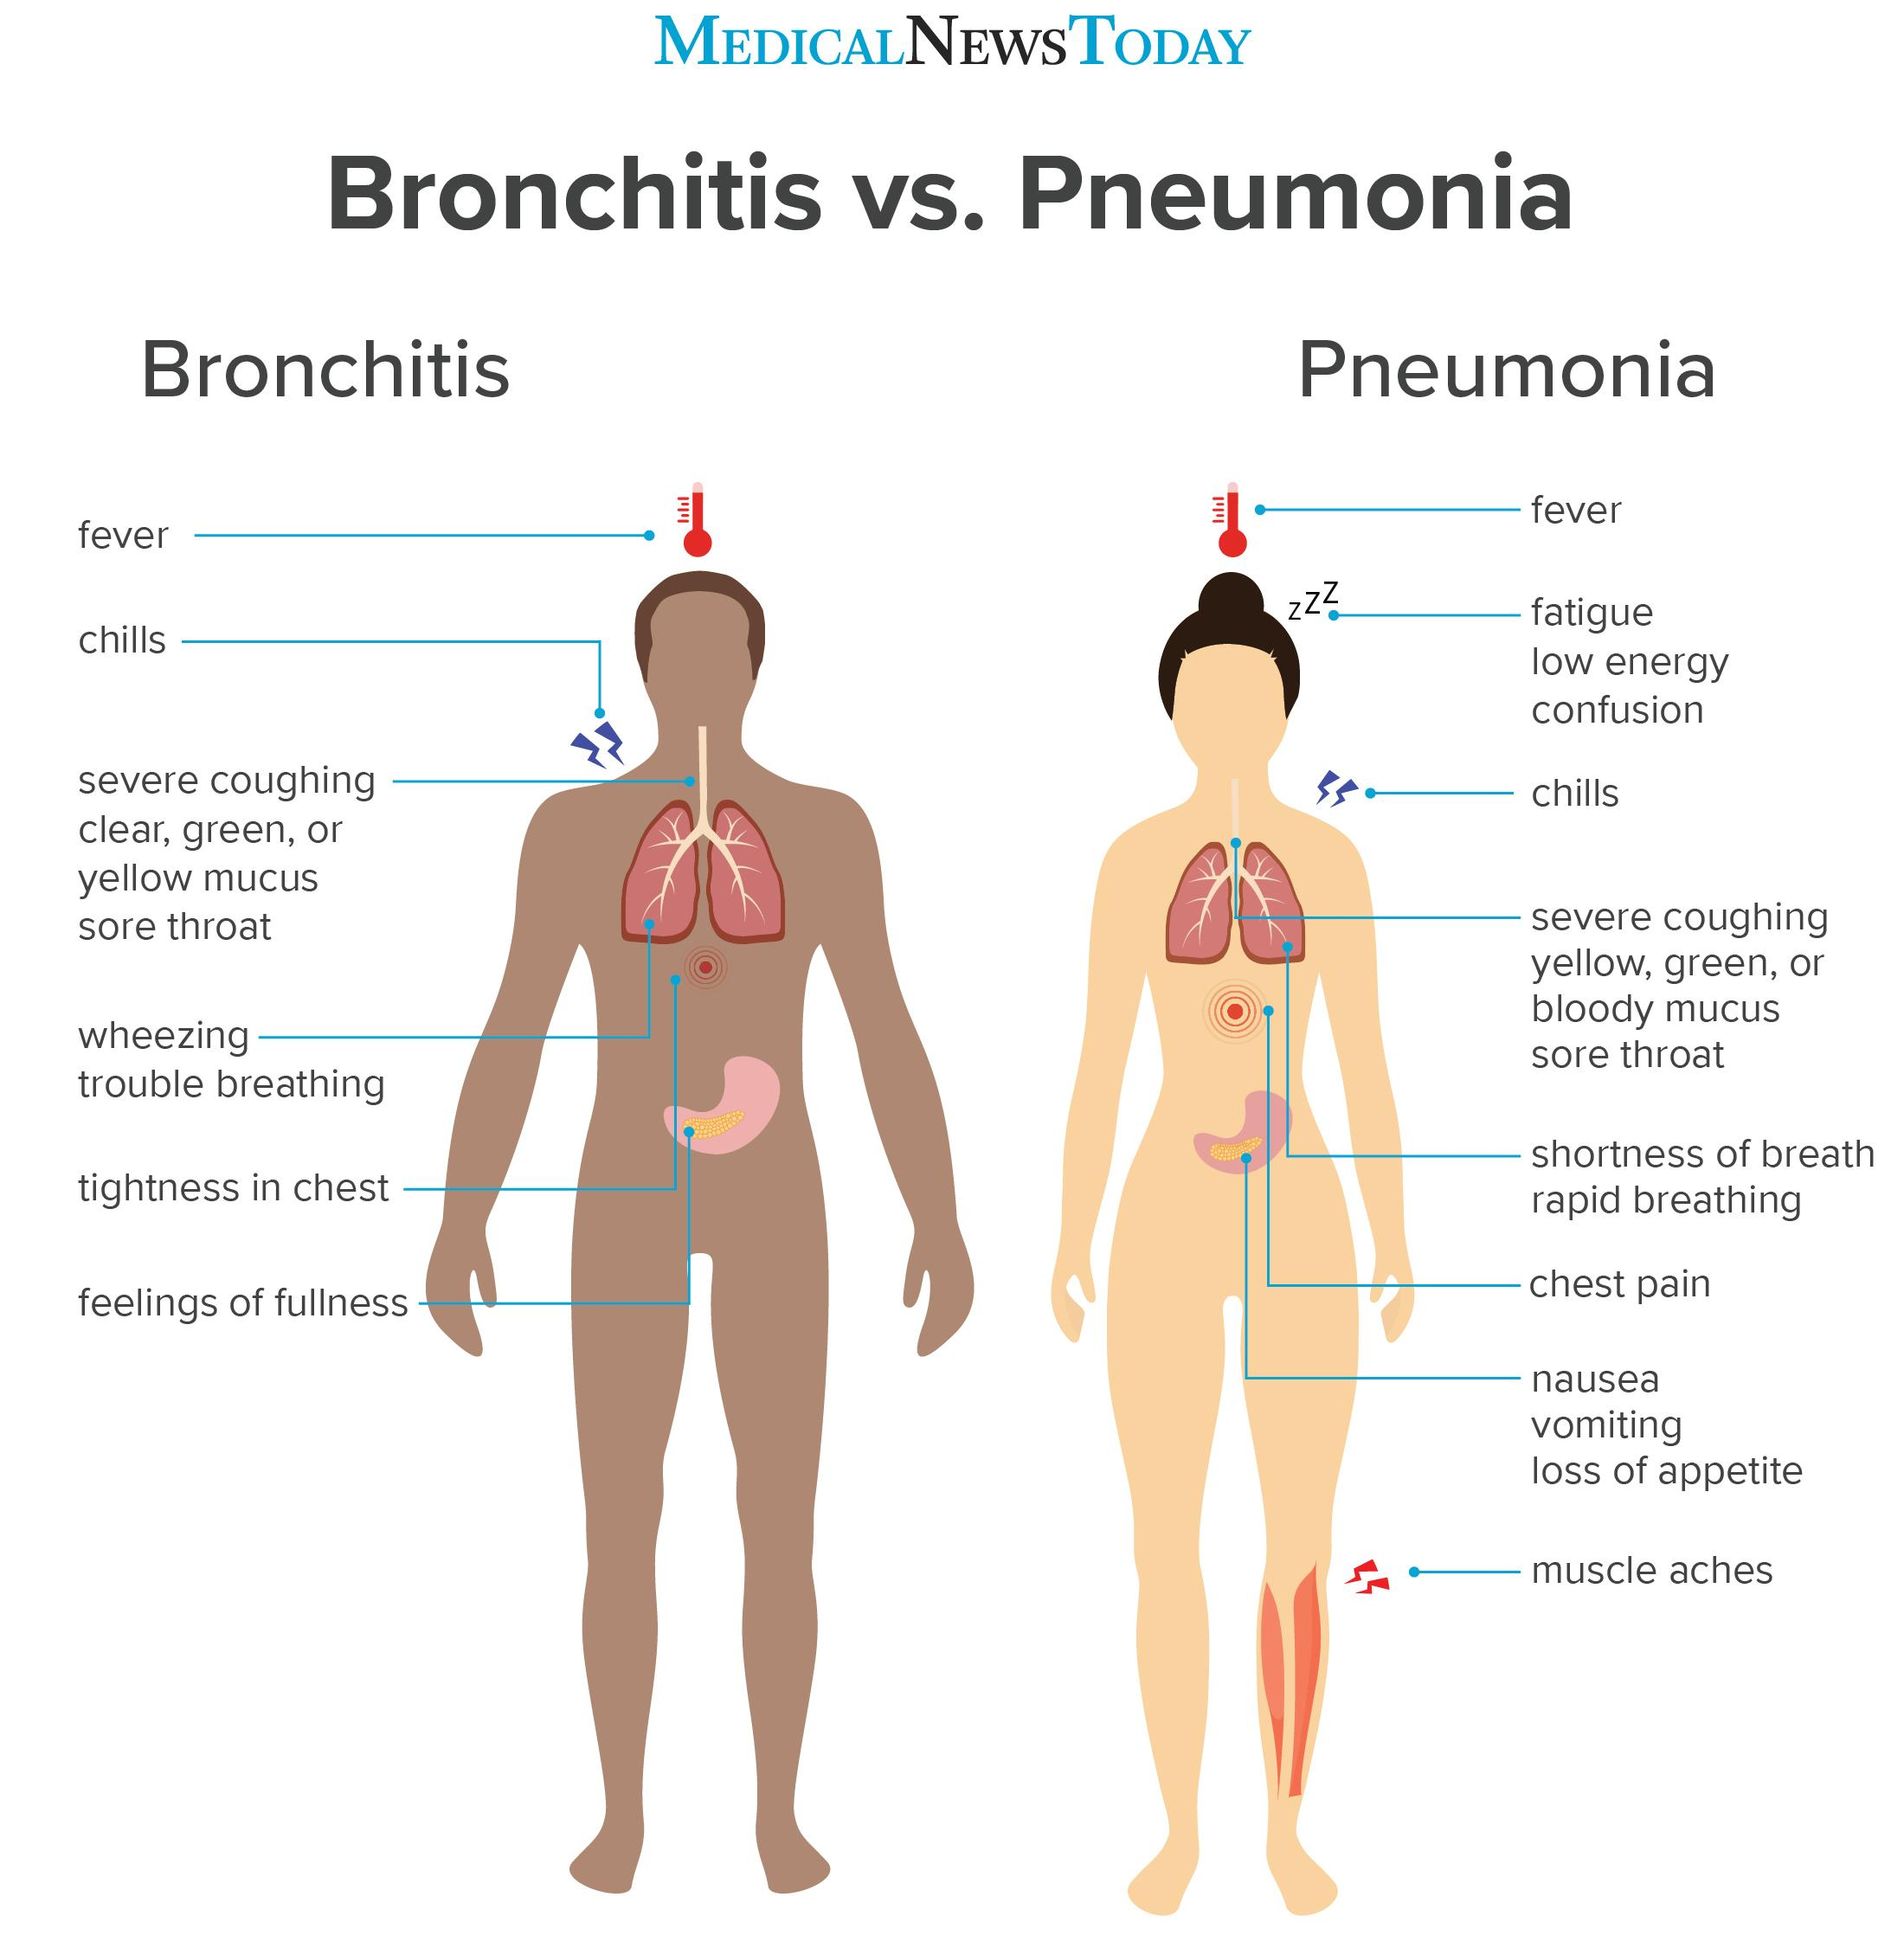 an infographic showing the symptoms of bronchitis vs Pneumonia